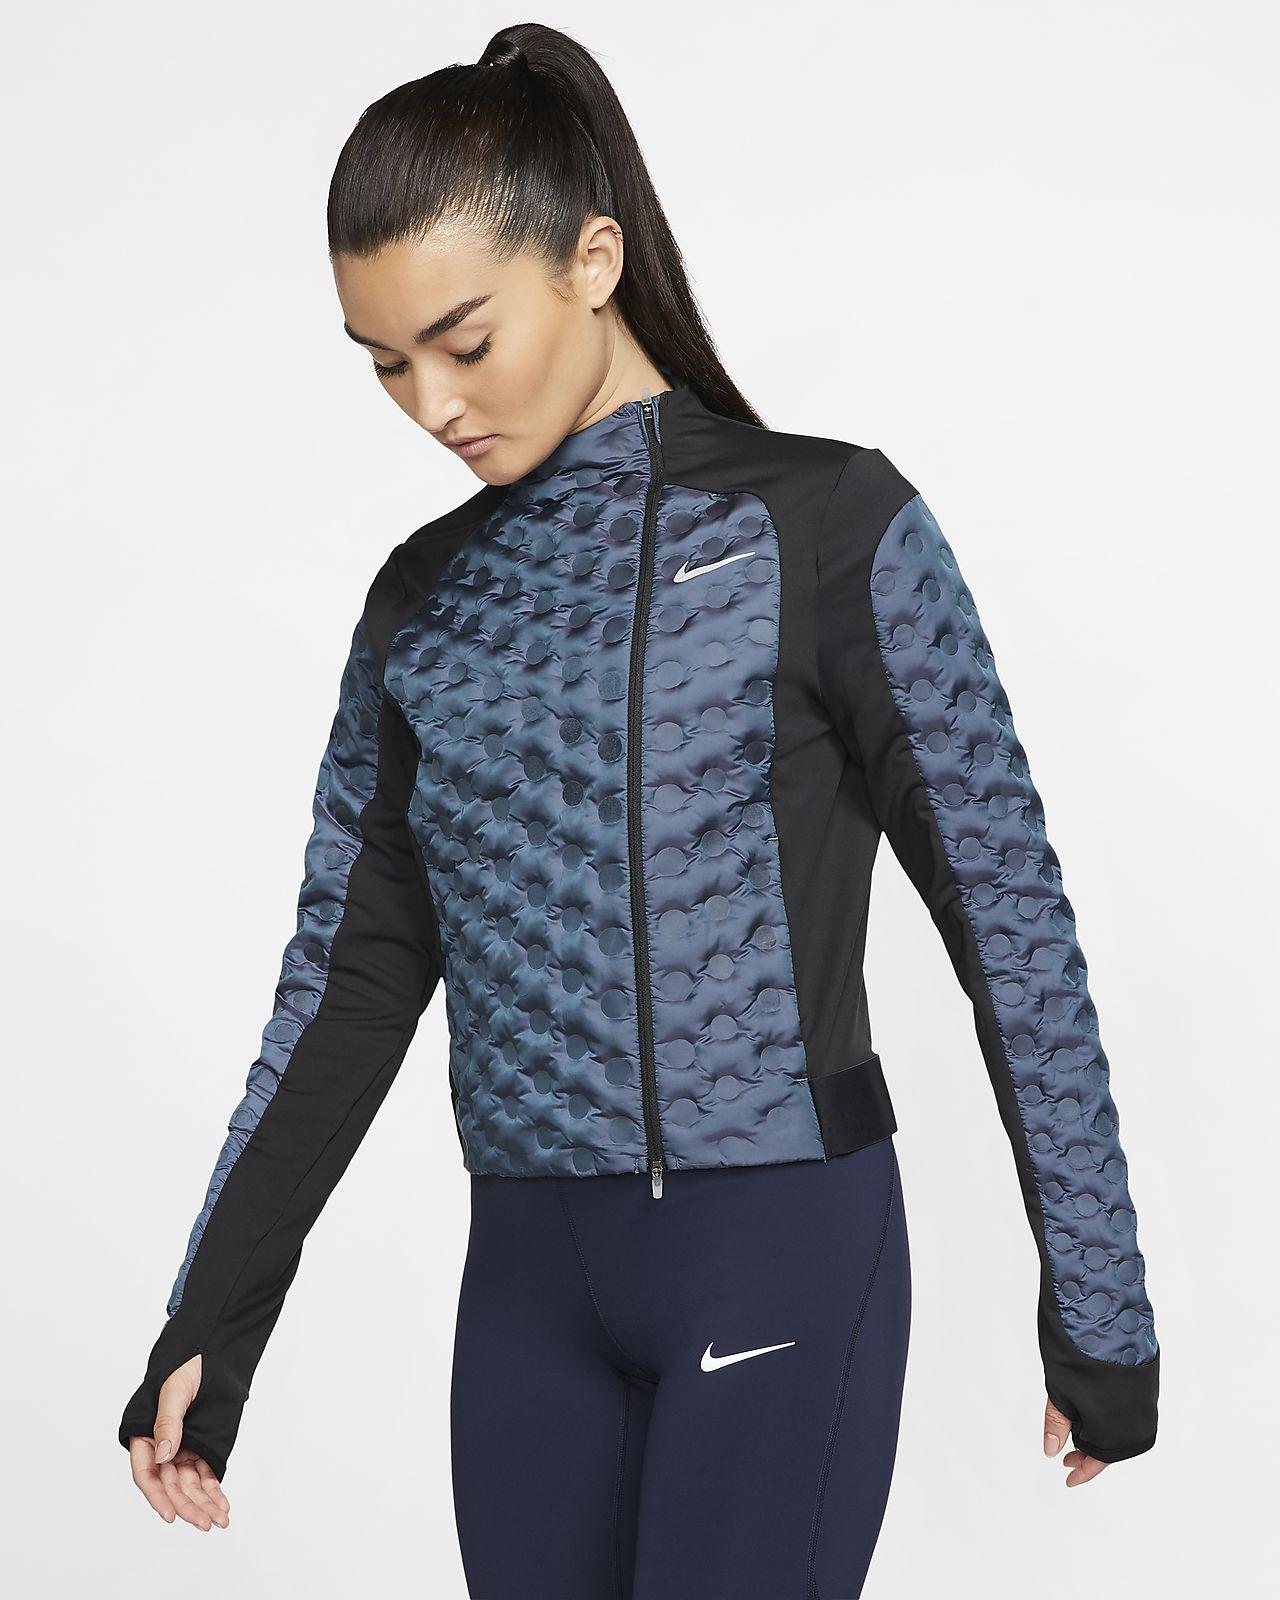 Nike AeroLoft løpejakke til dame